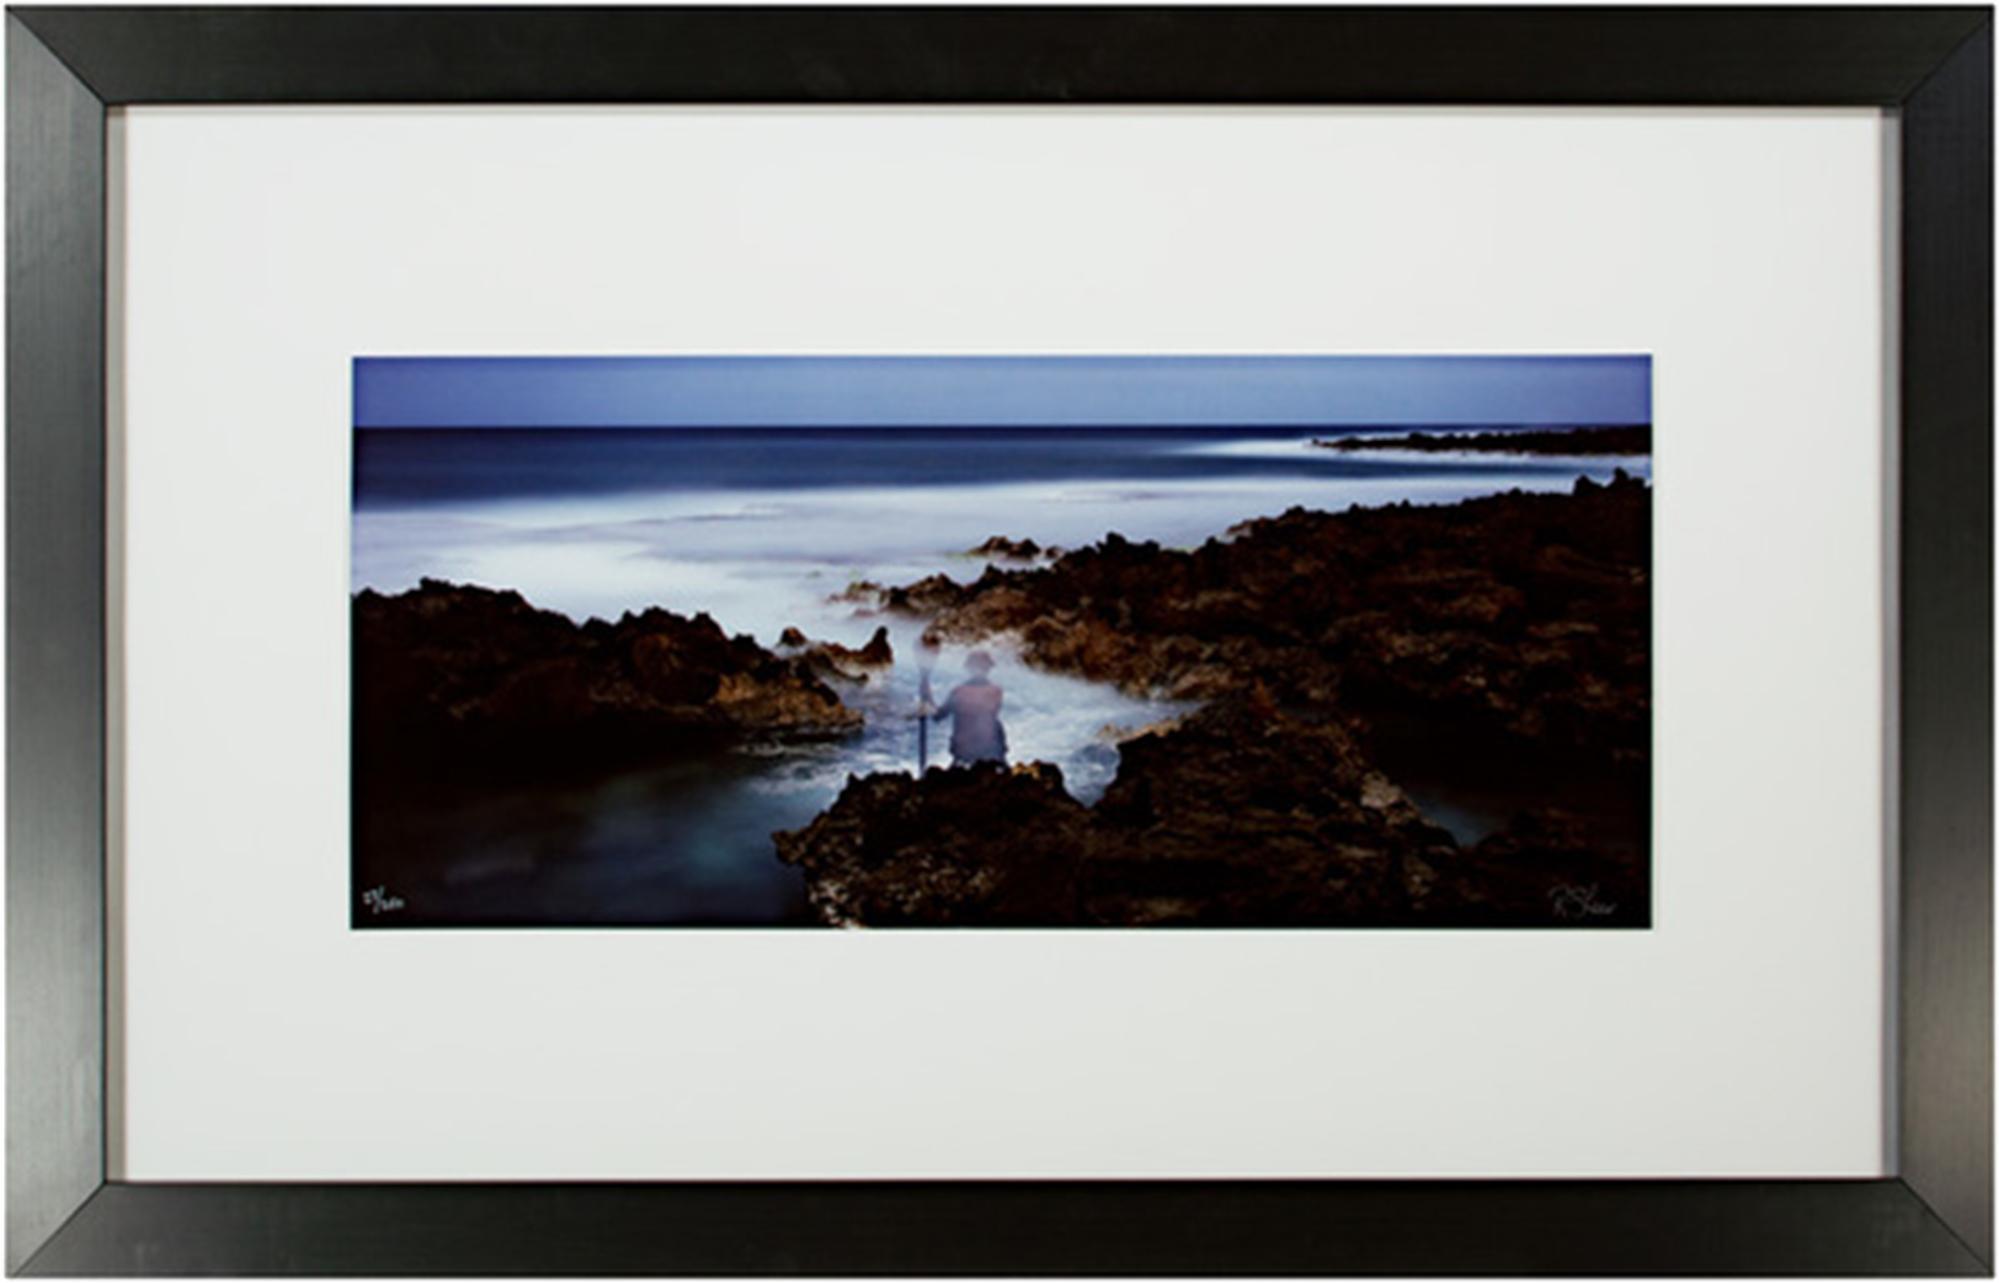 The Ocean Spirit, Pupukea, Oahu by Robert Kawika Sheer